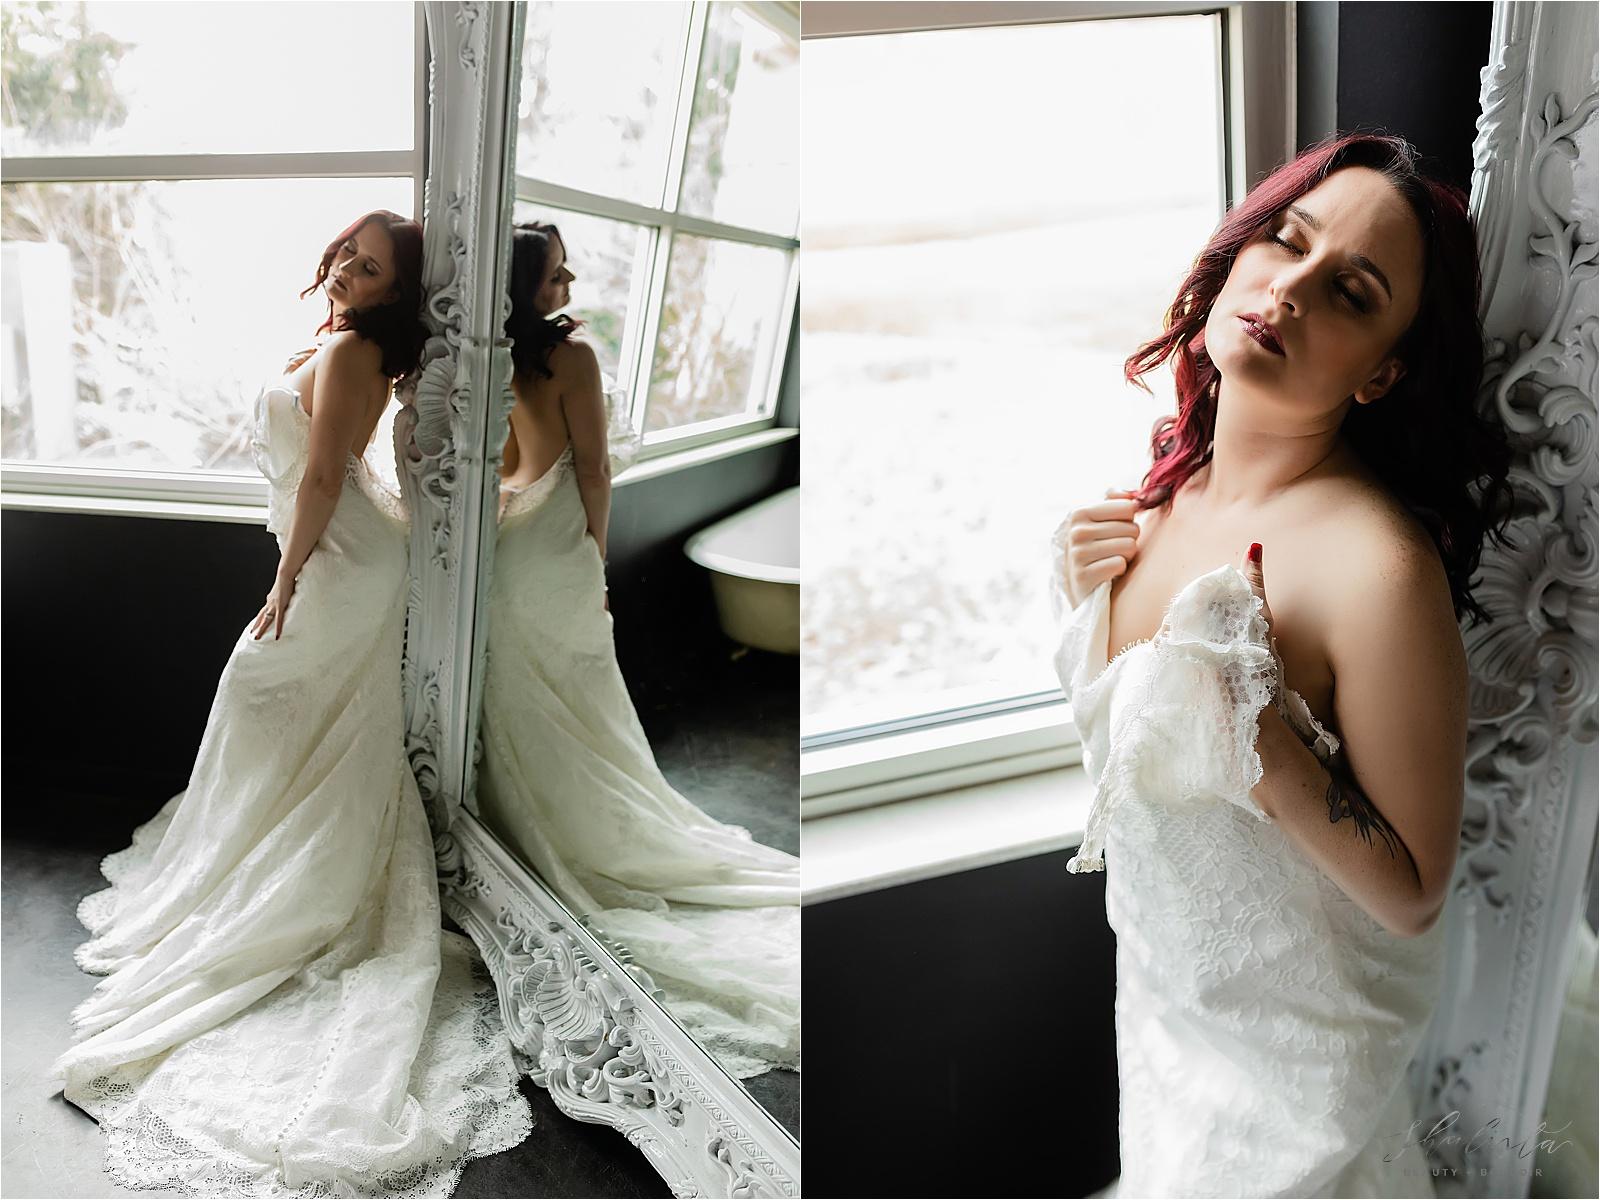 Wedding Dress in Mirror Boudoir